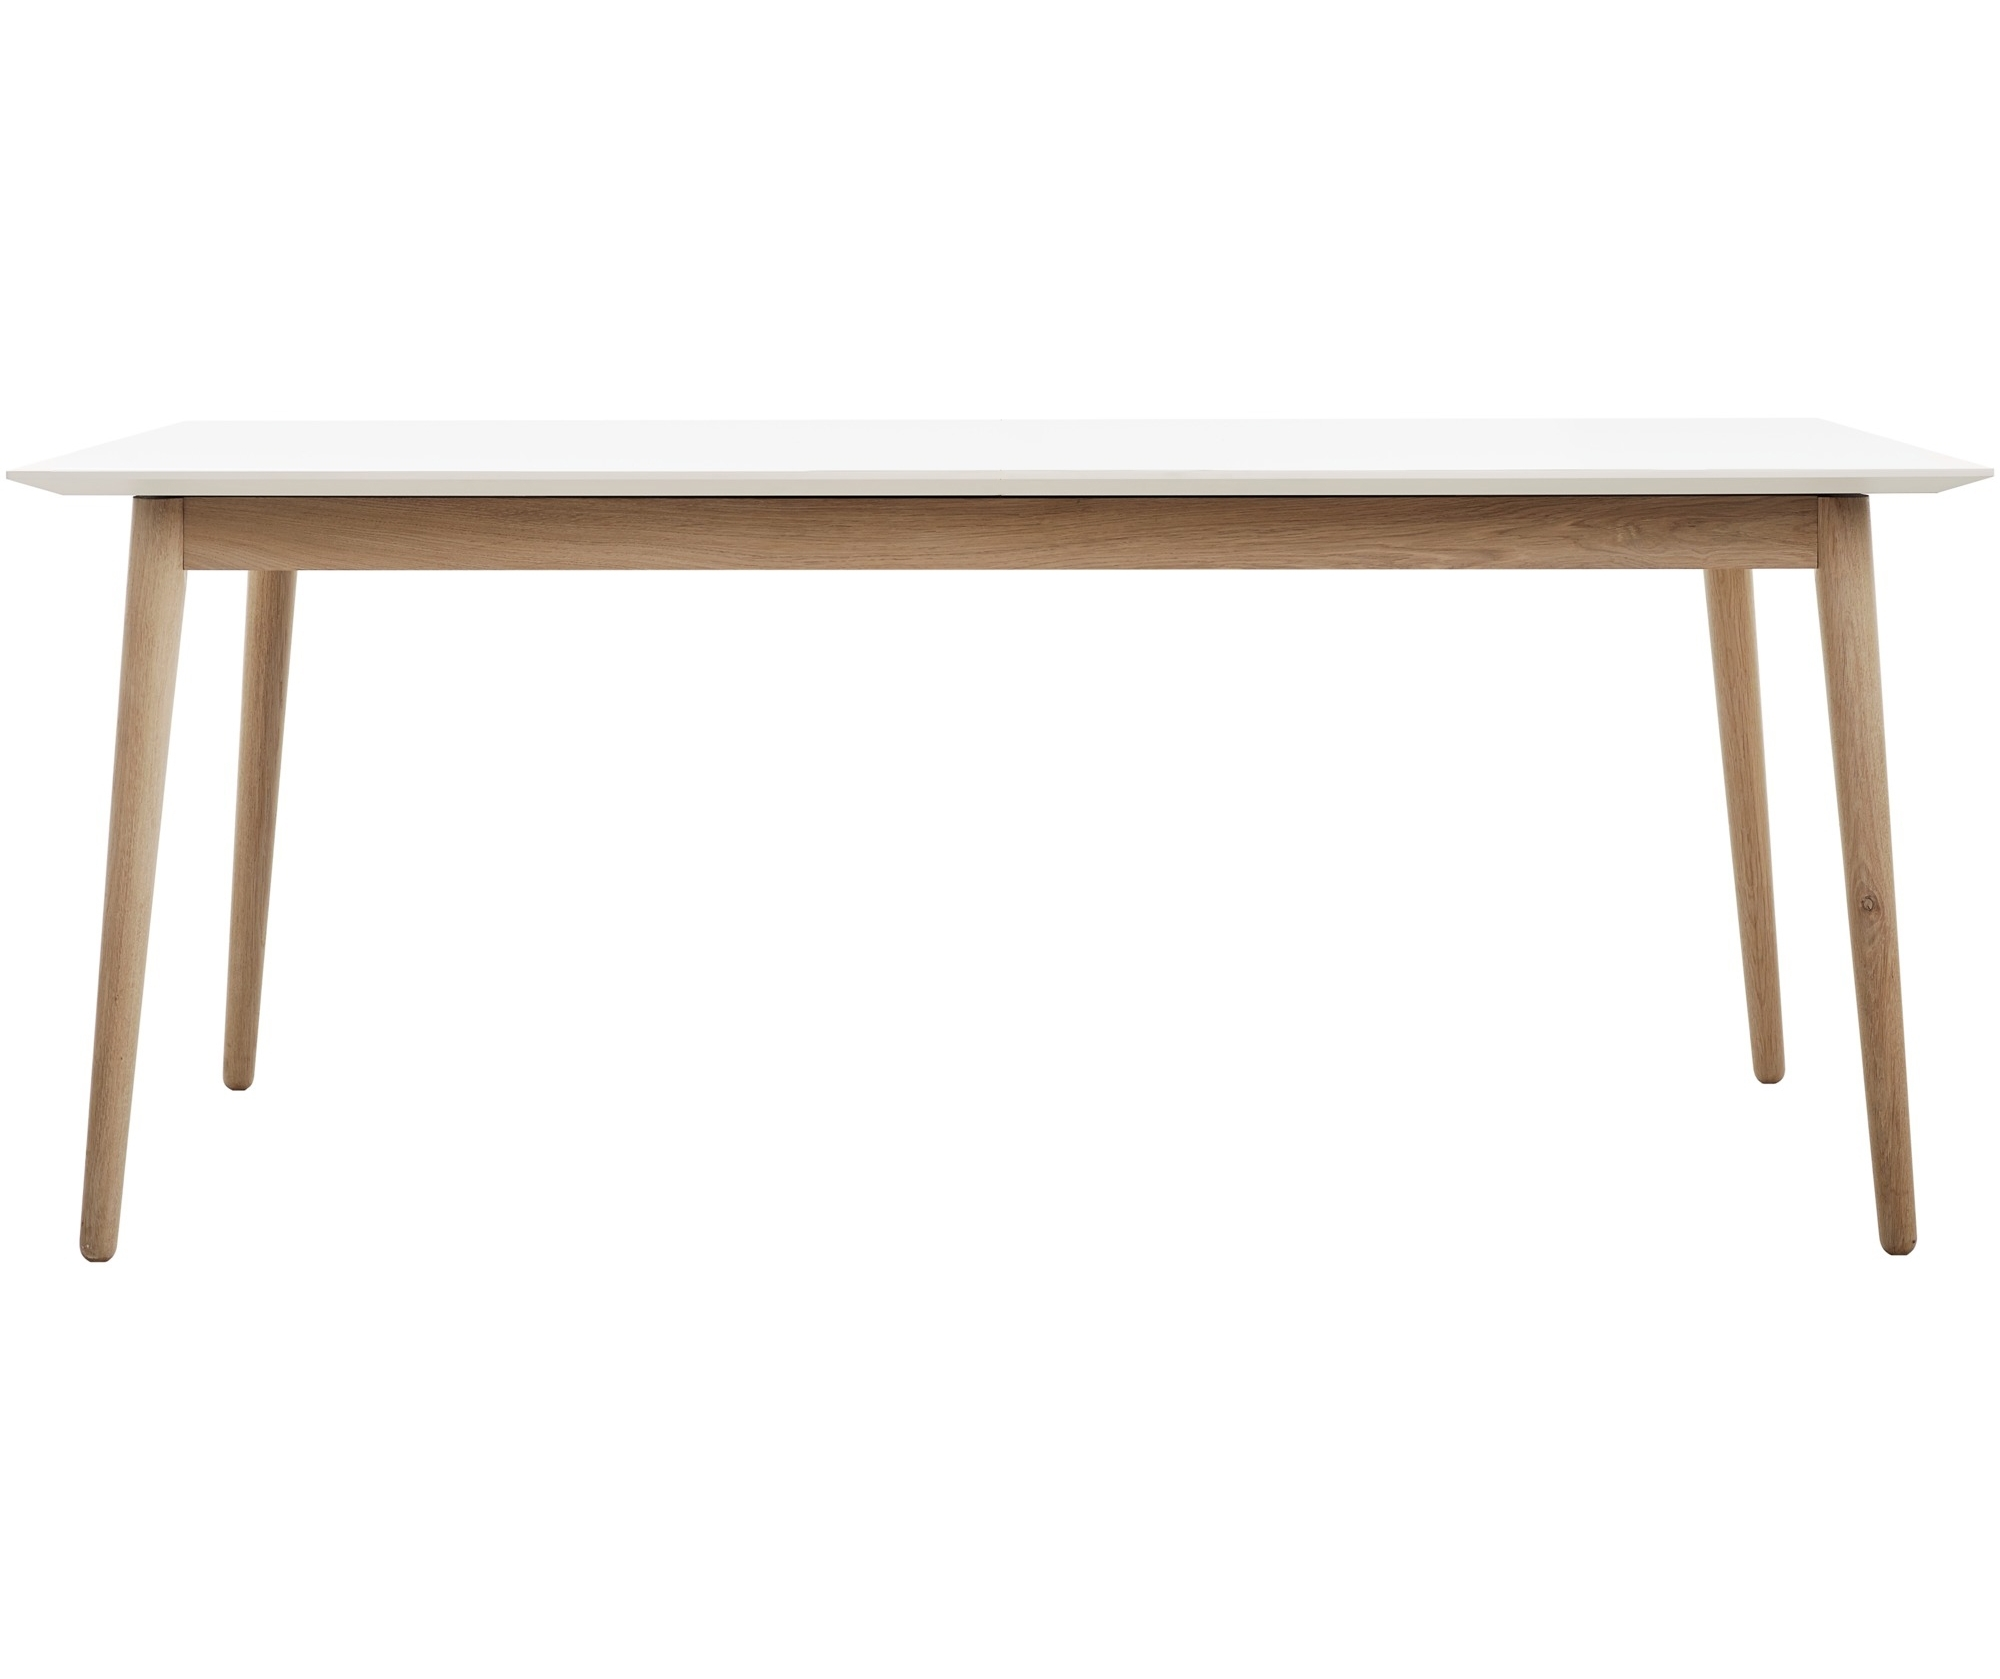 Кухонный стол MassiveM 4151845 от thefurnish